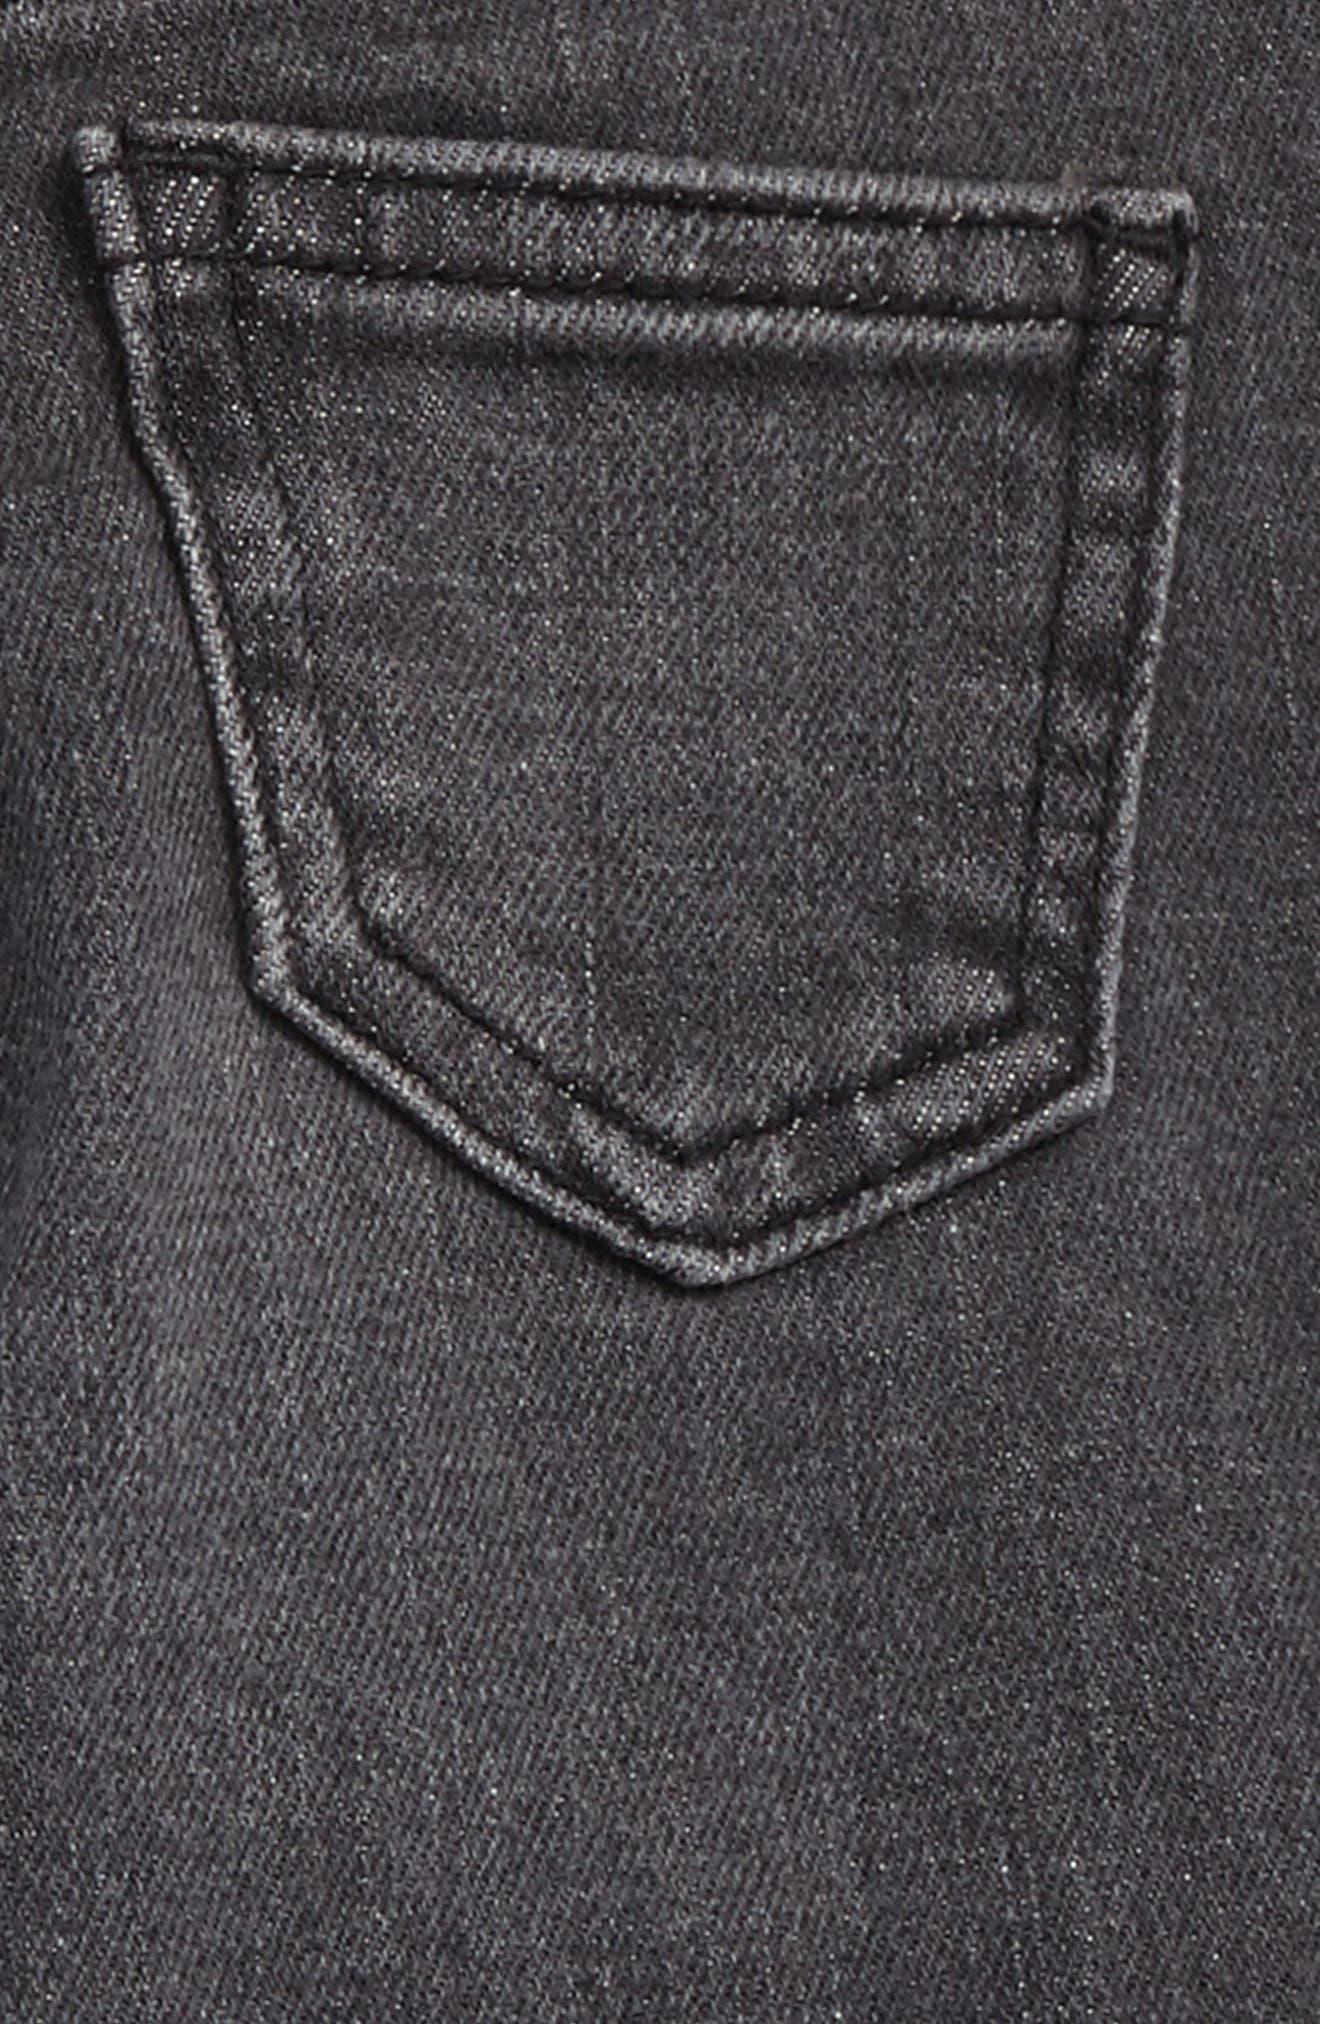 Sasha Skinny Jeans,                             Alternate thumbnail 3, color,                             020